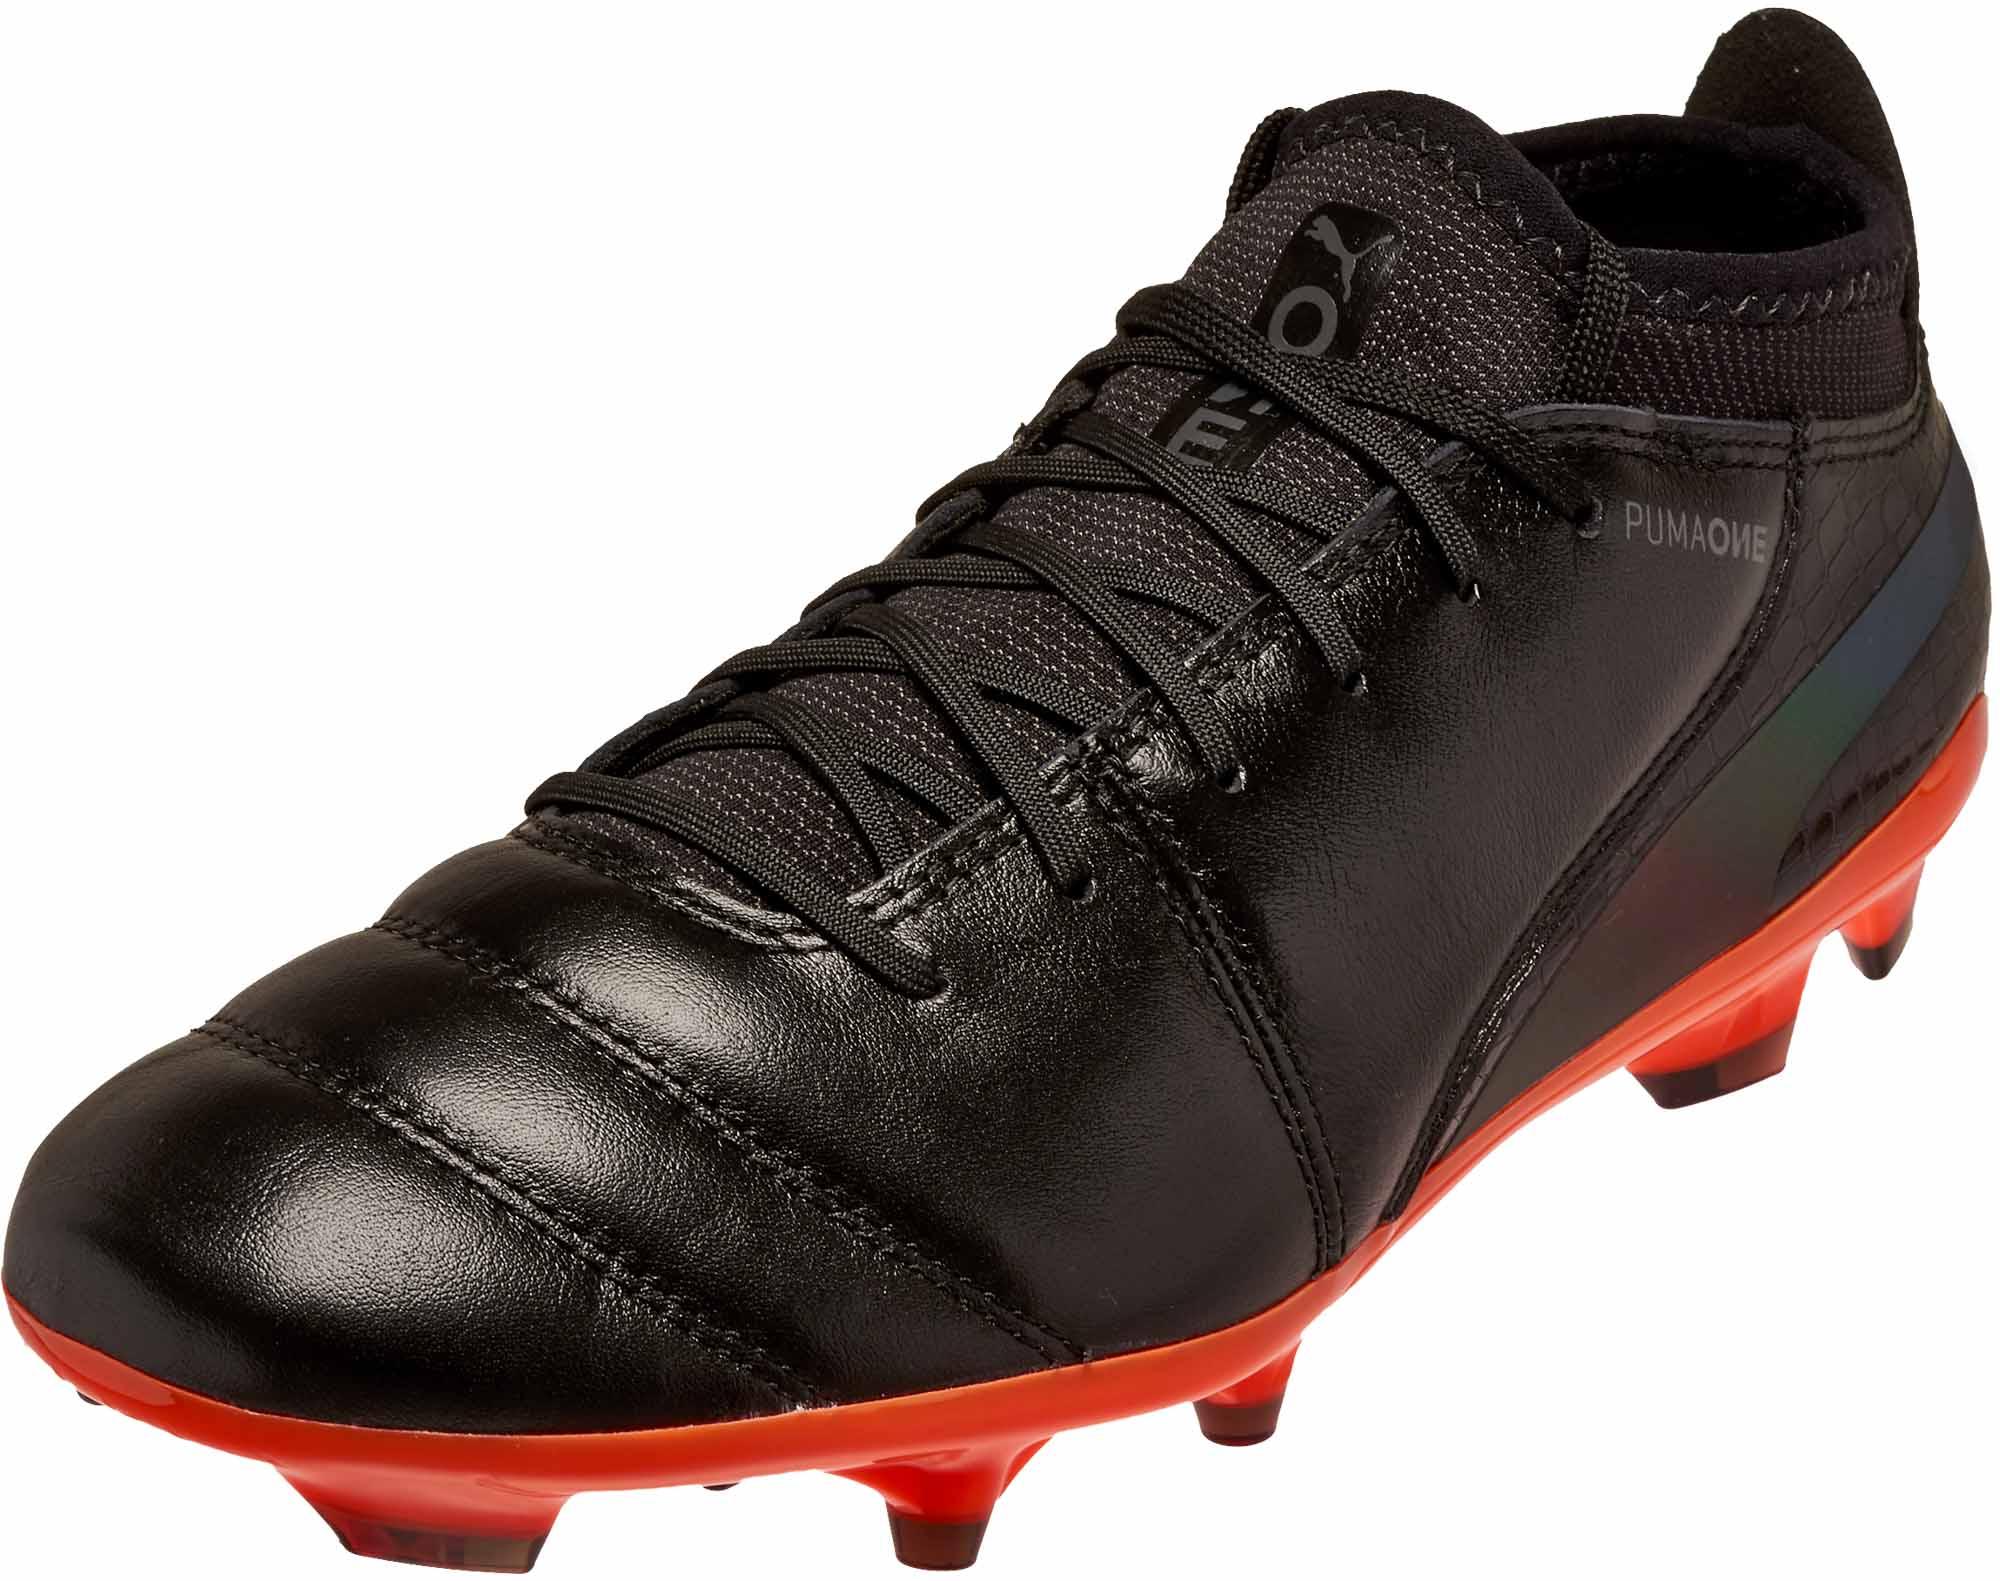 868c60567 Puma One Lux 2 FG - Black Puma Soccer Shoes